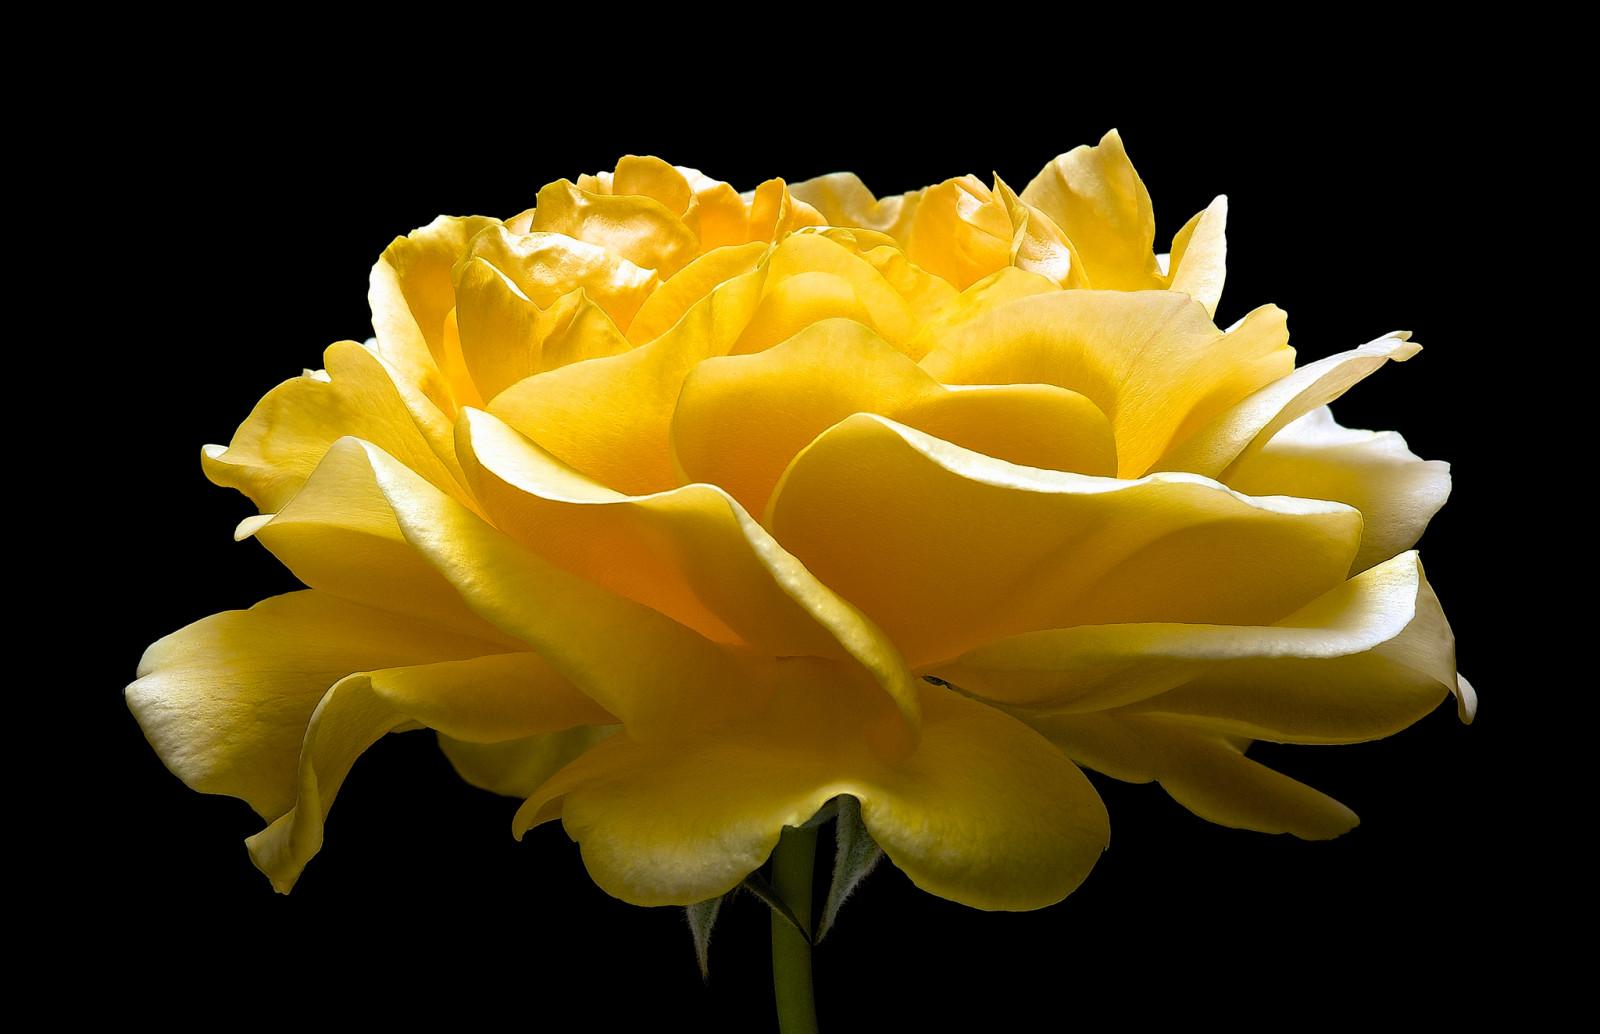 Открыток, картинки желтая роза на черном фоне